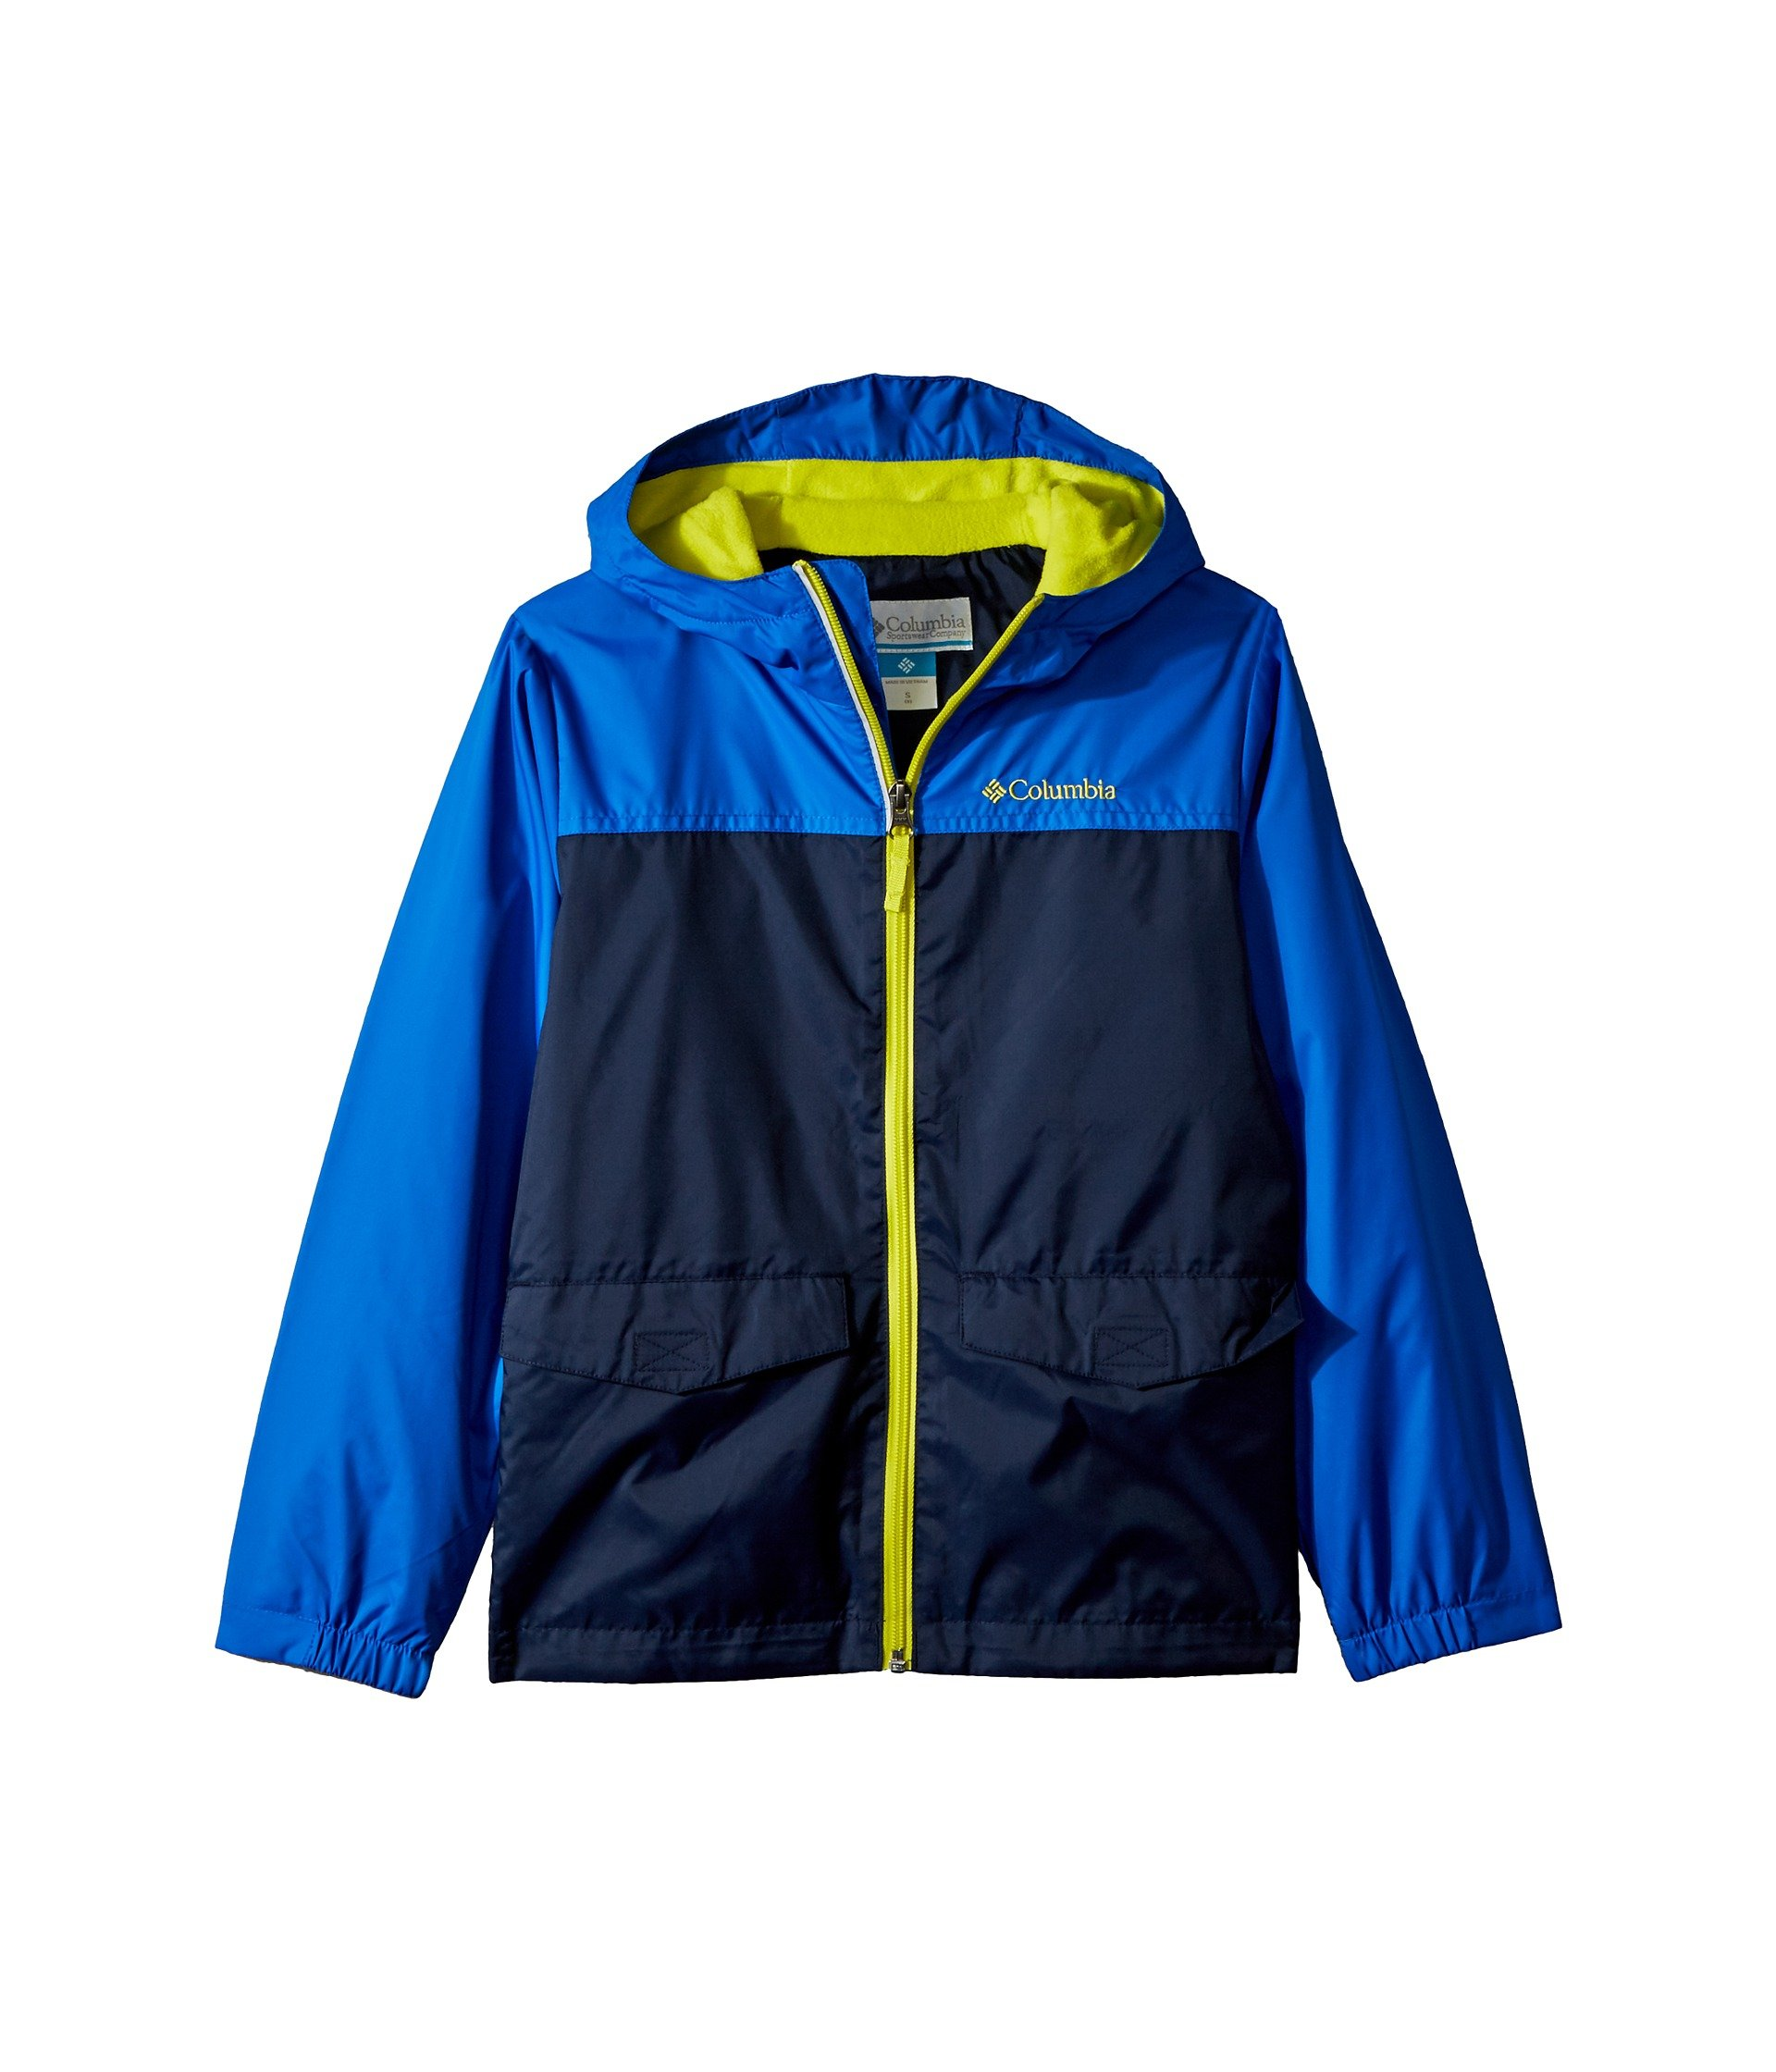 Columbia Kids Boy's Rain-Zilla¿ Jacket (Little Kids/Big Kids) Collegiate Navy/Super Blue/Zour X-Large